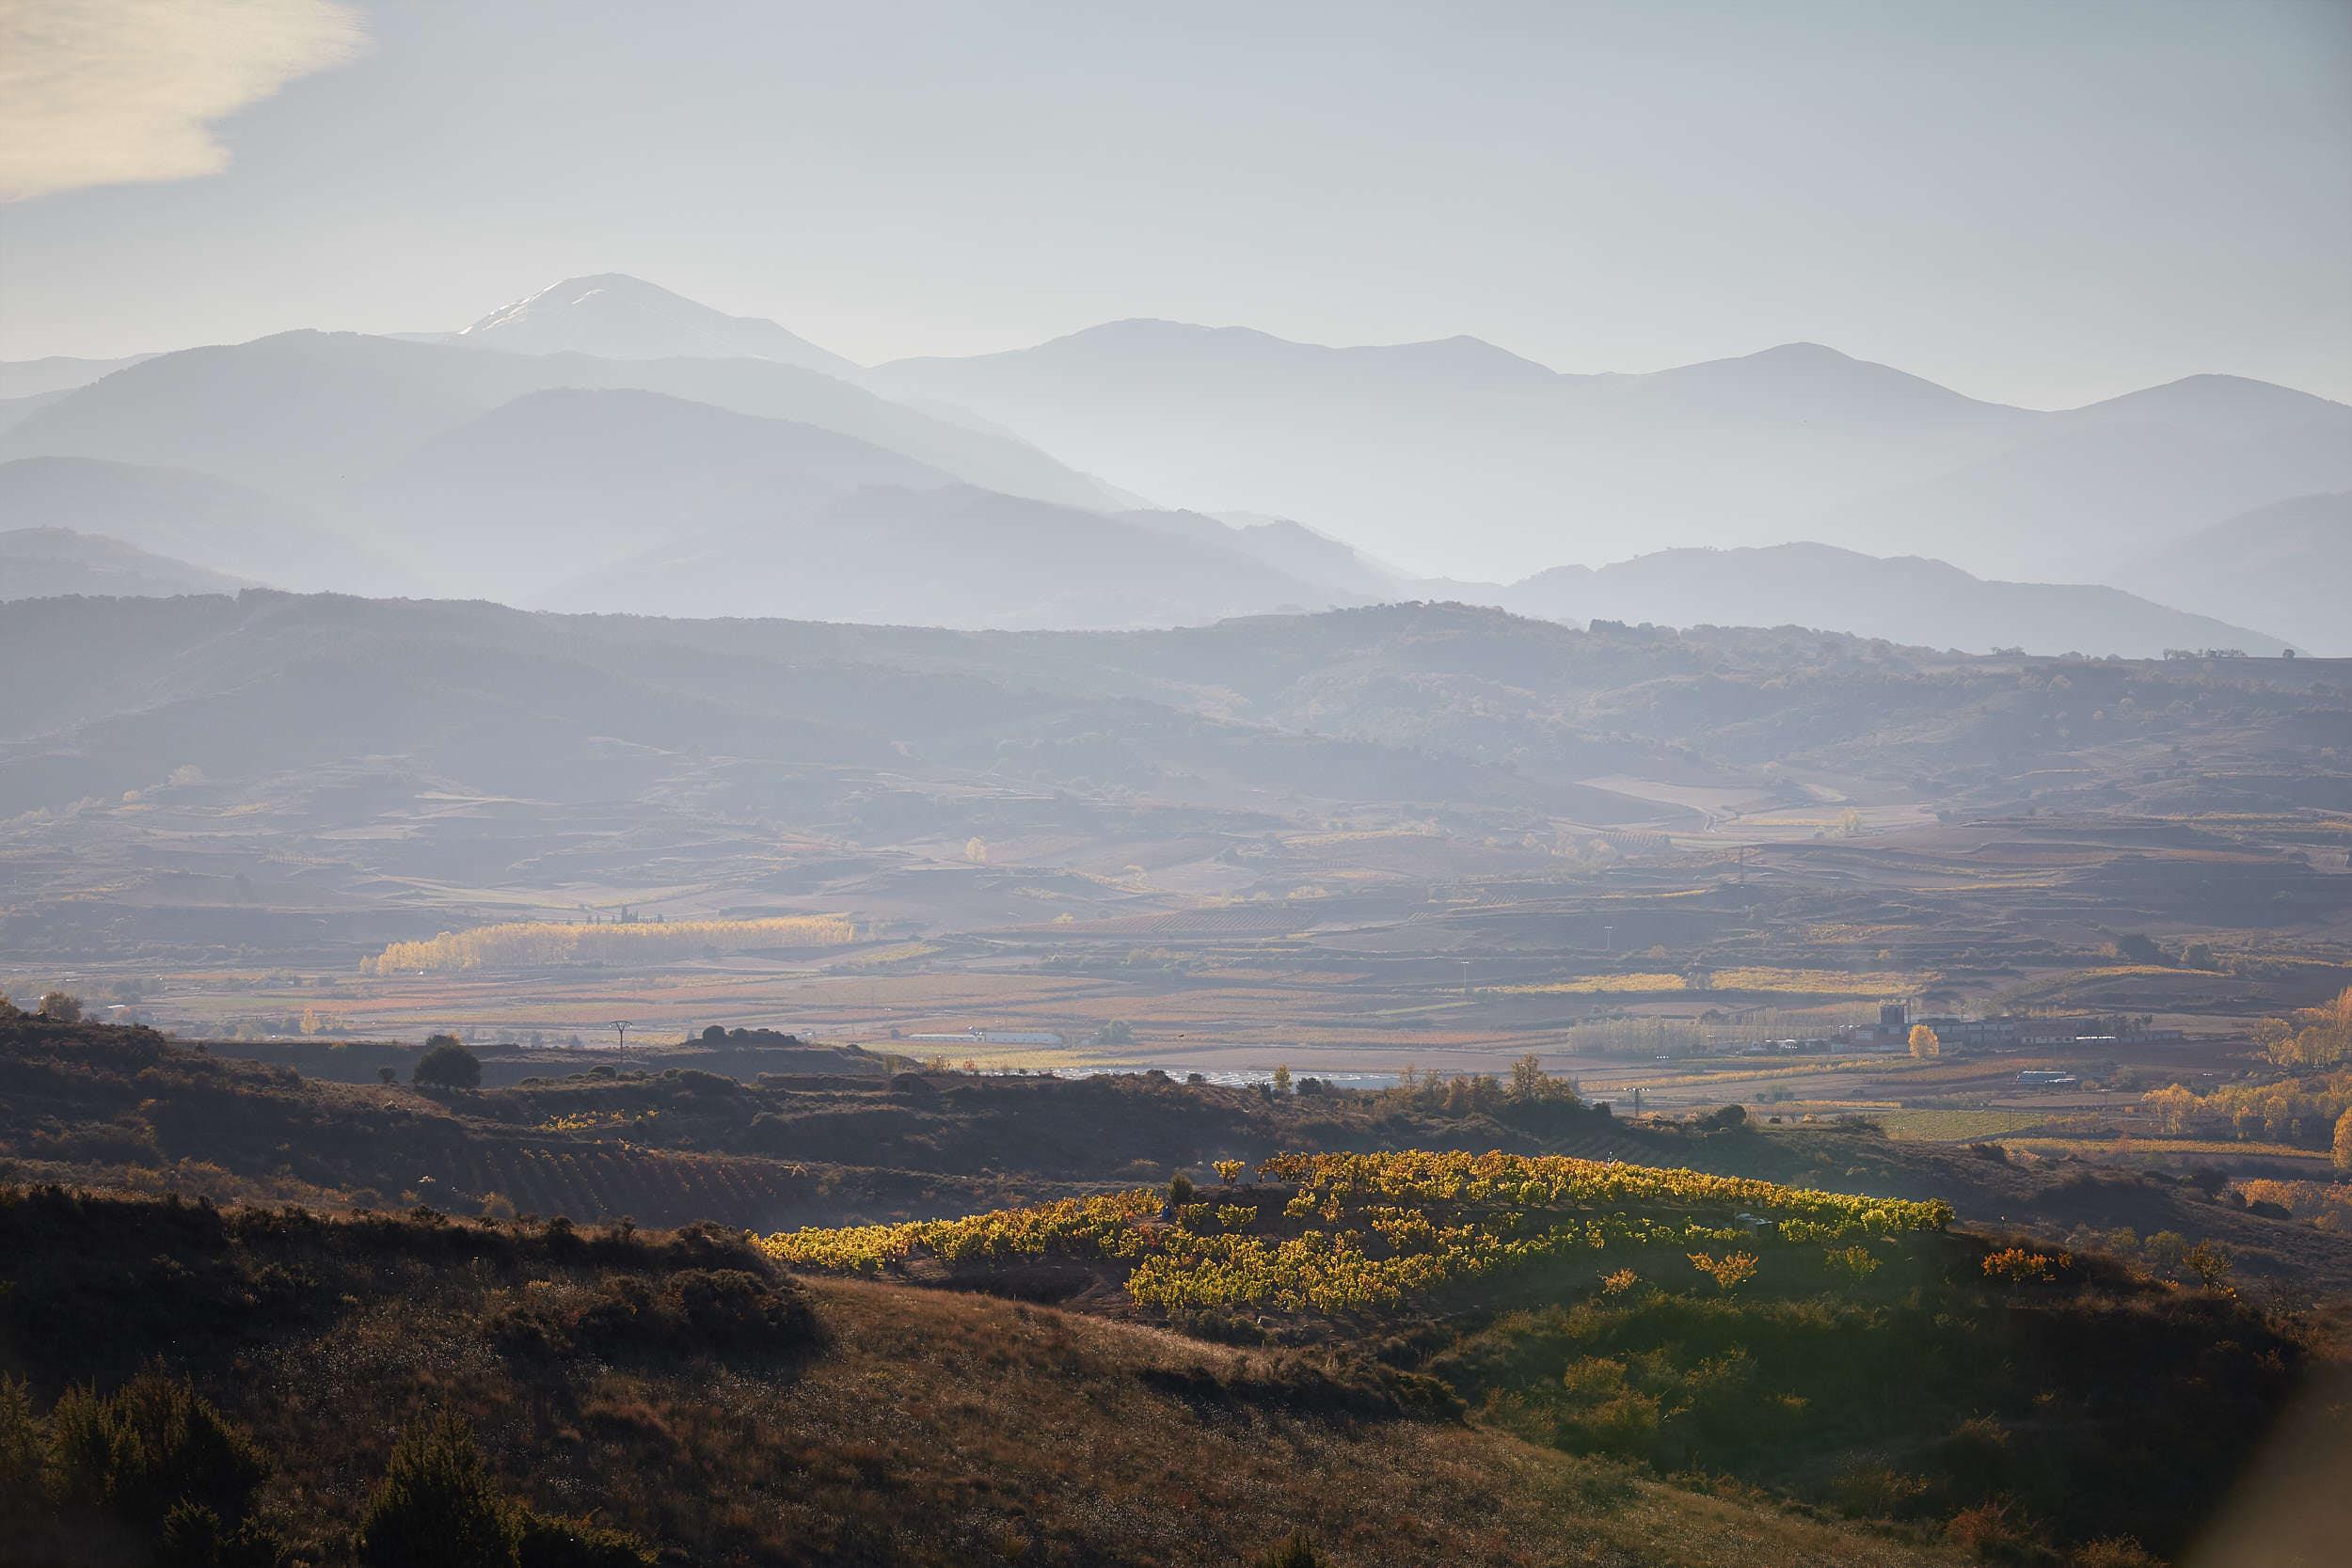 15/11/16 Rioja vineyards near Camprovín, La Rioja, Spain. Foto de James Sturcke | www.sturcke.org